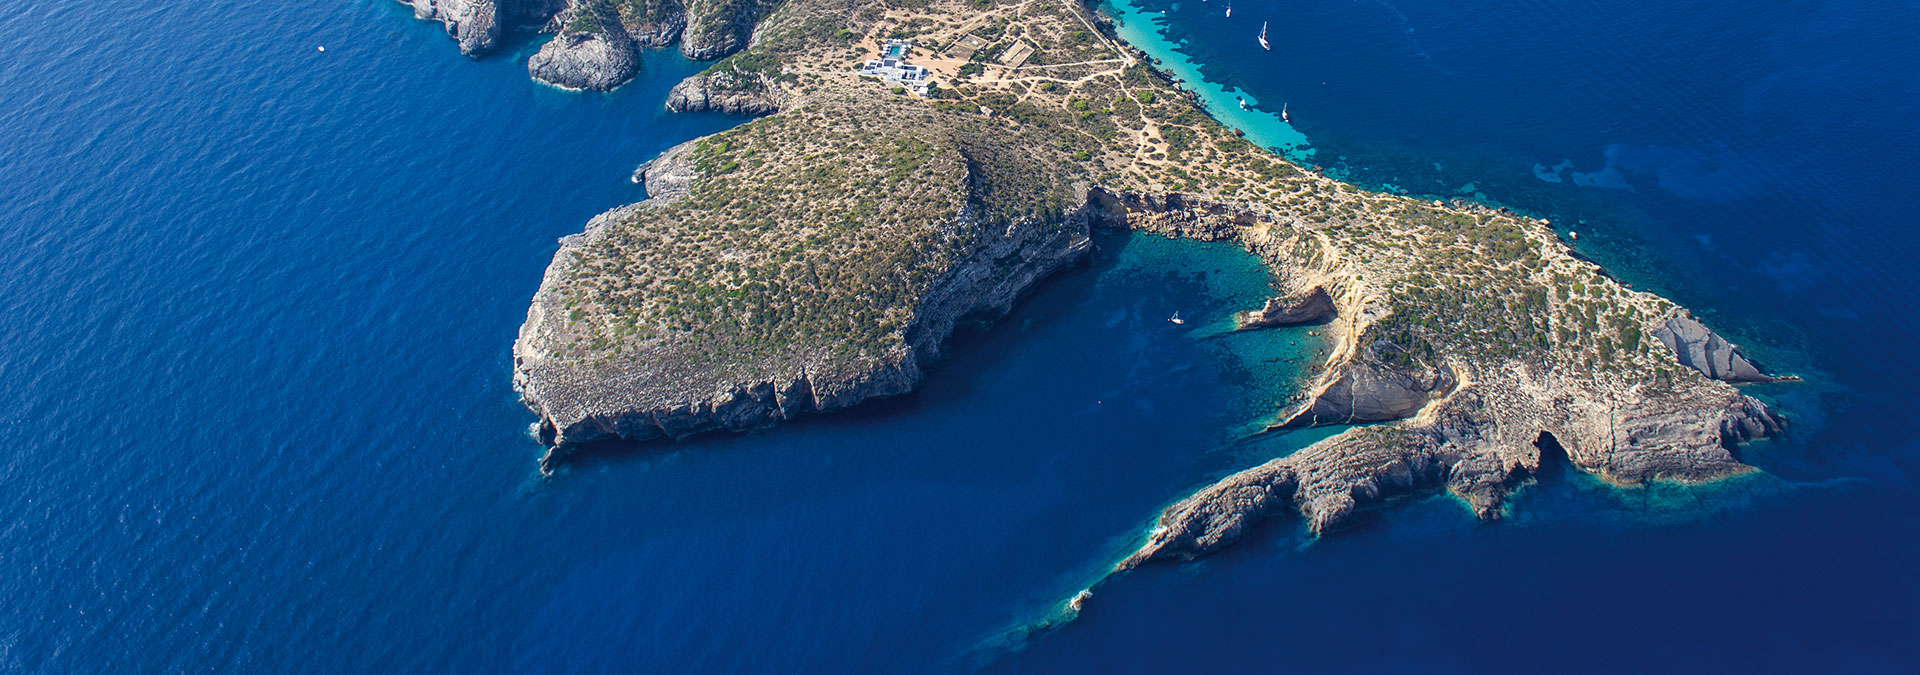 tagomago-luxury-island-hideaway